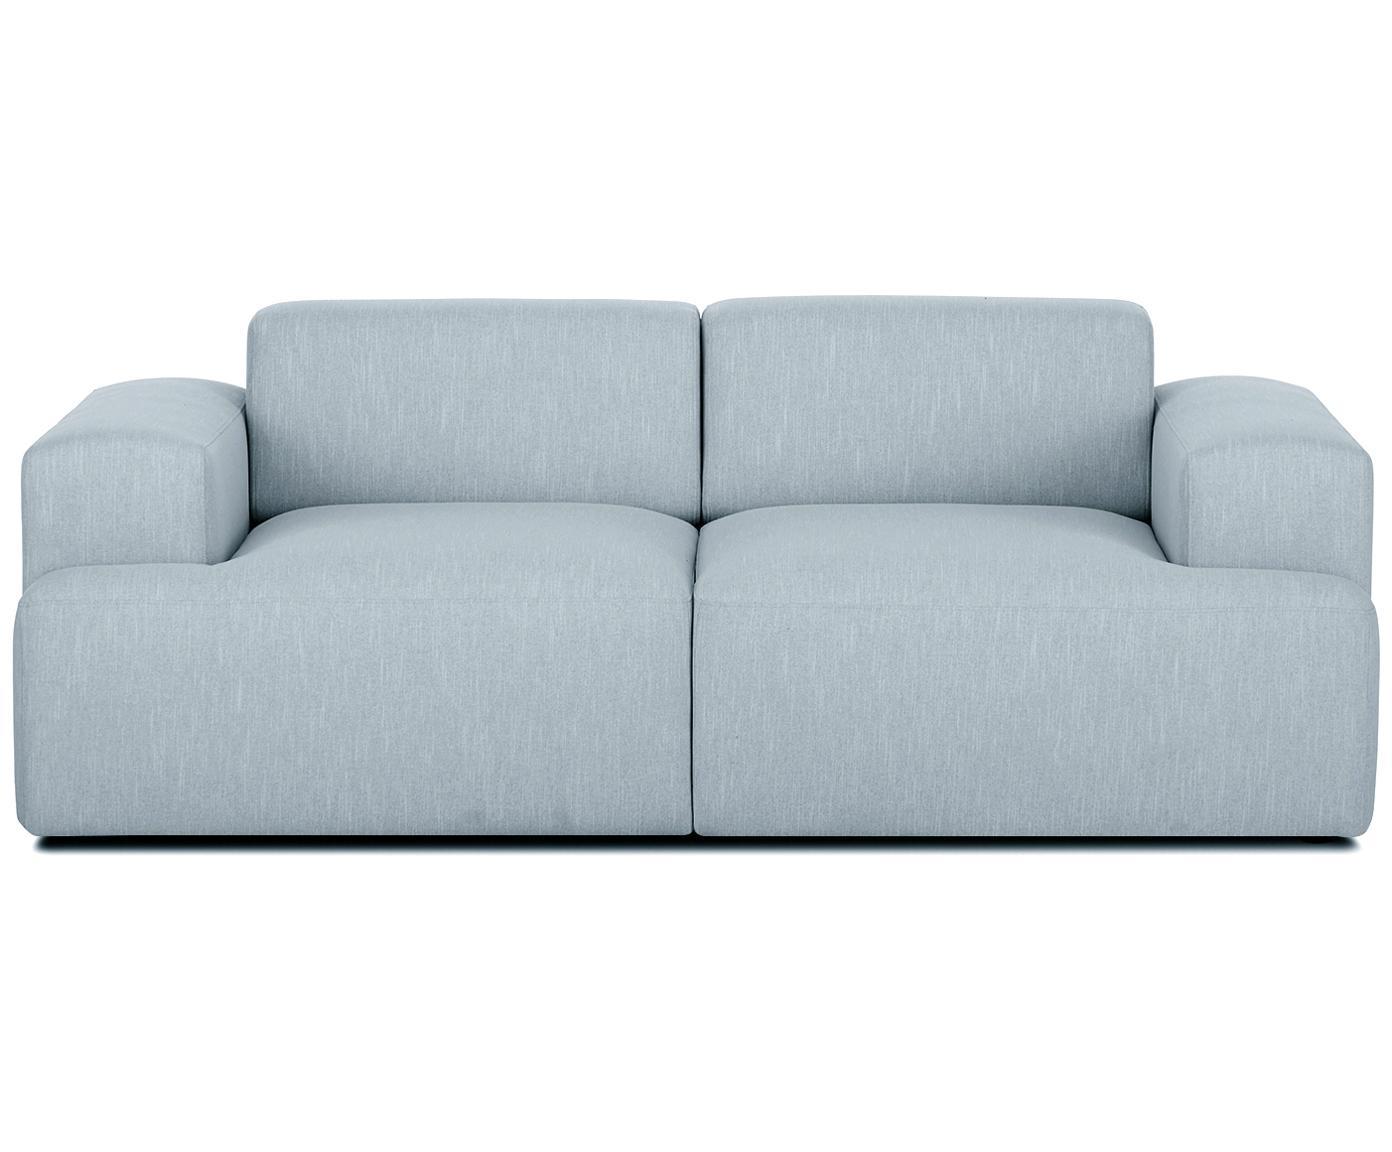 Sofa Melva (2-Sitzer), Bezug: Polyester 35.000 Scheuert, Gestell: Massives Kiefernholz, Spa, Füße: Kiefernholz, Webstoff Blaugrau, B 200 x T 101 cm